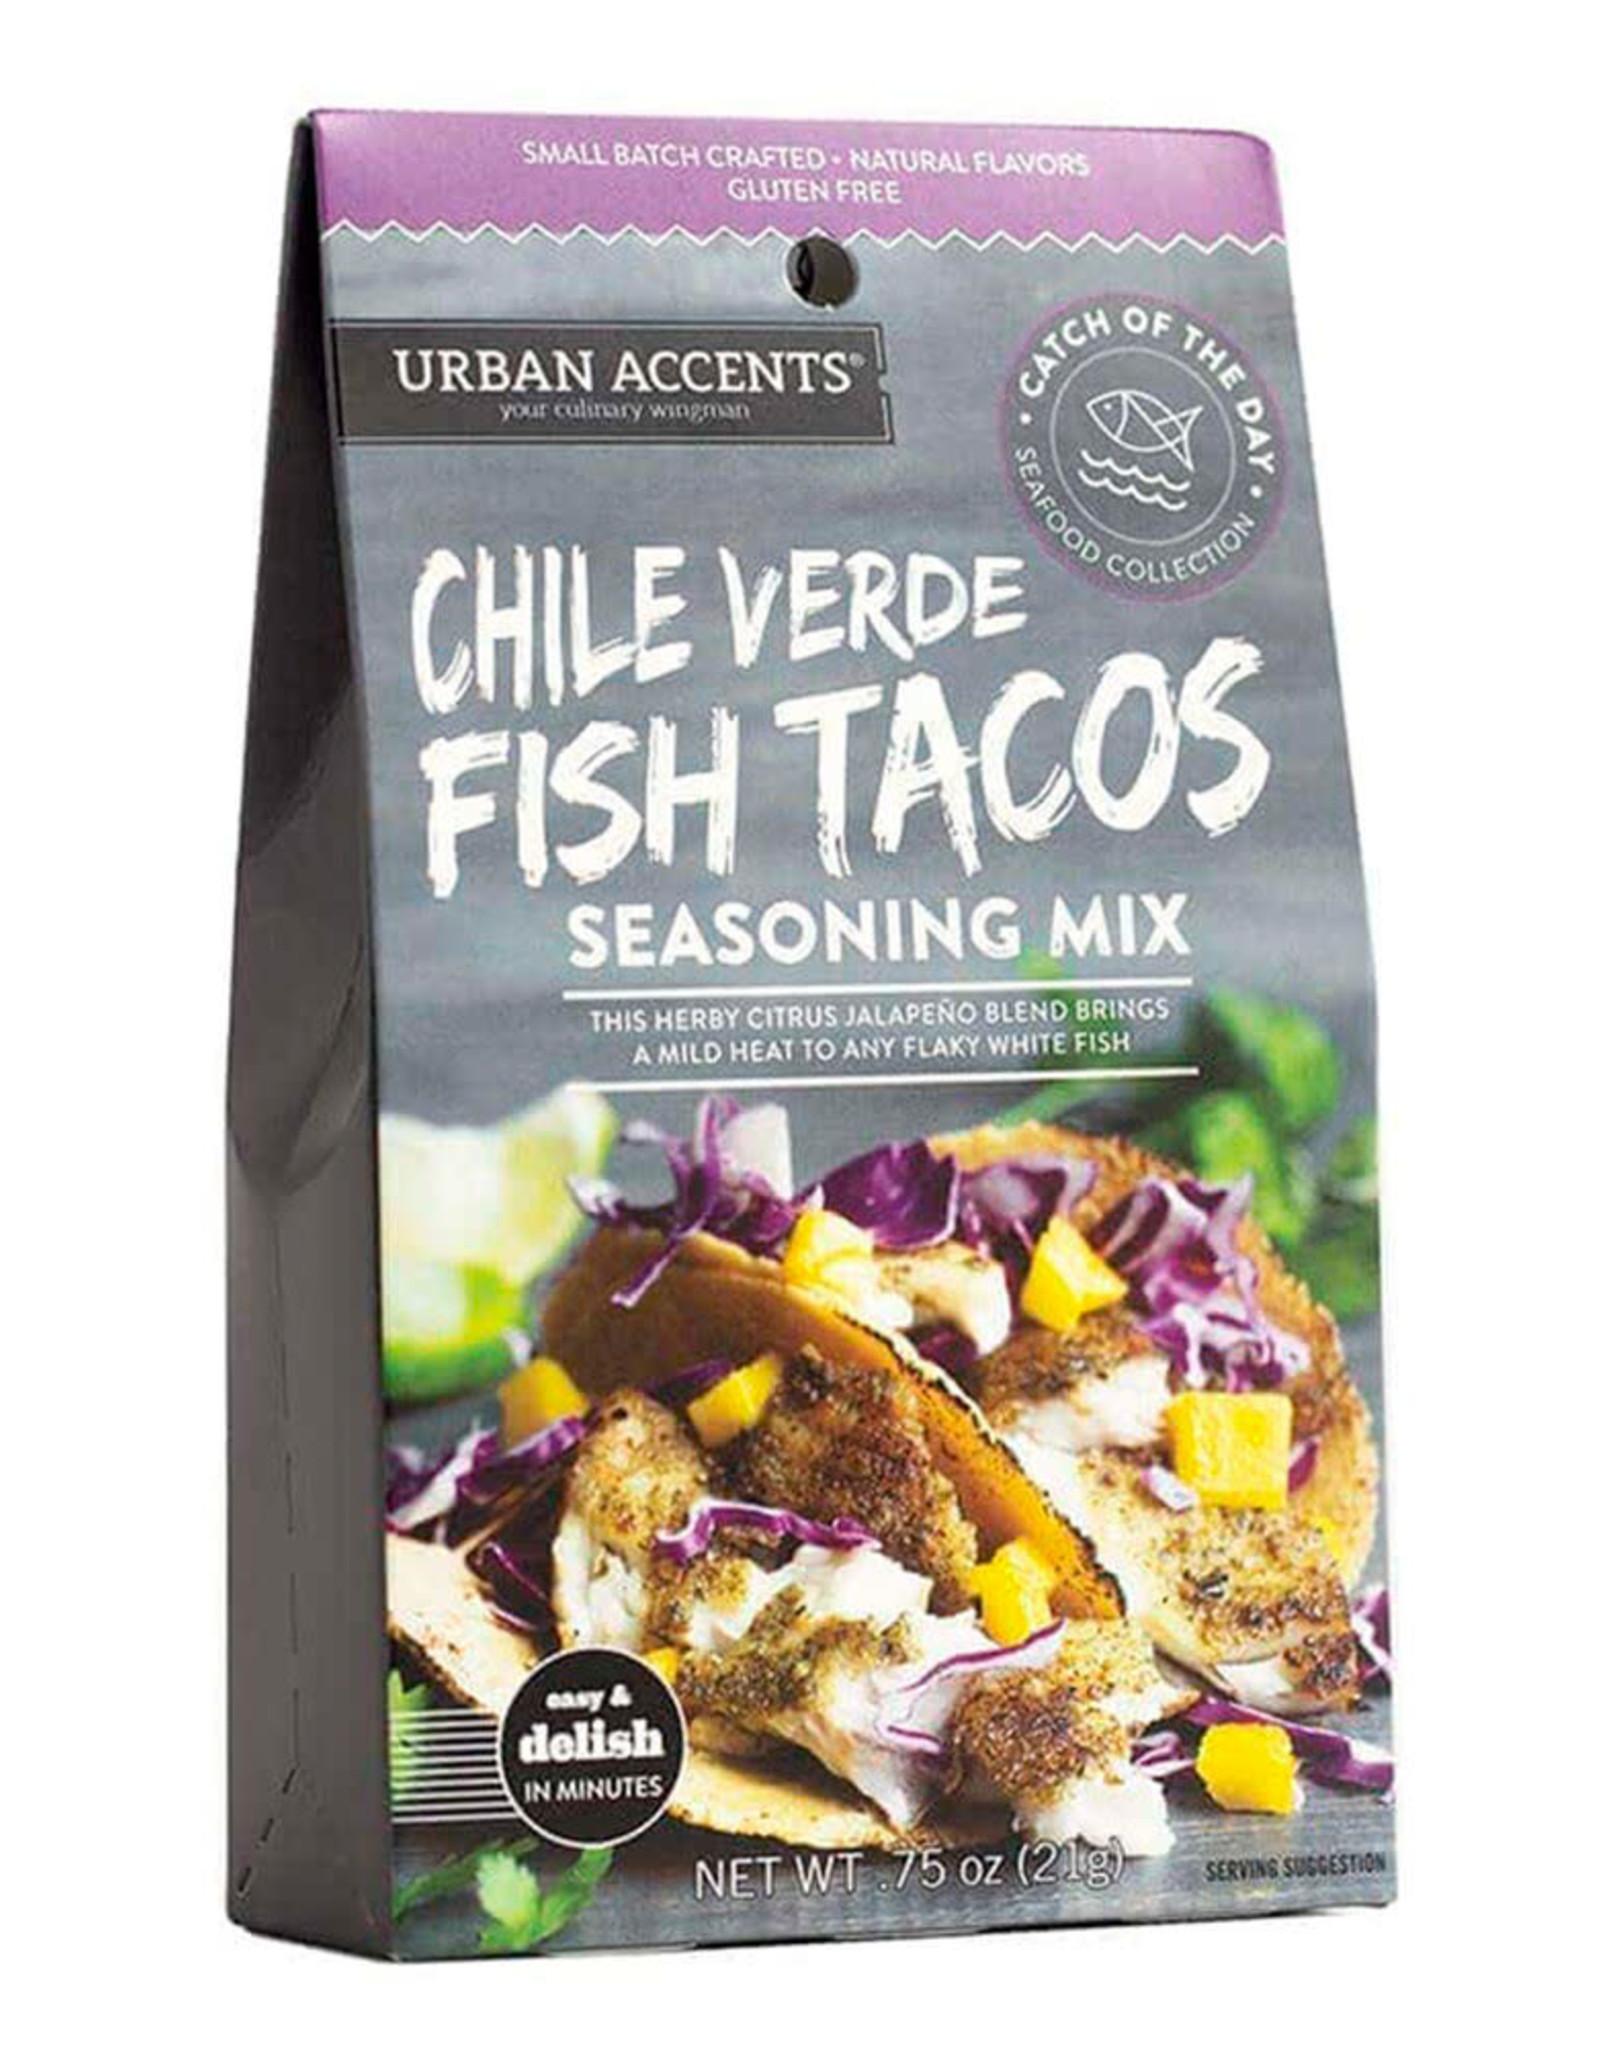 Urban Accents Chili Verde Fish Tacos